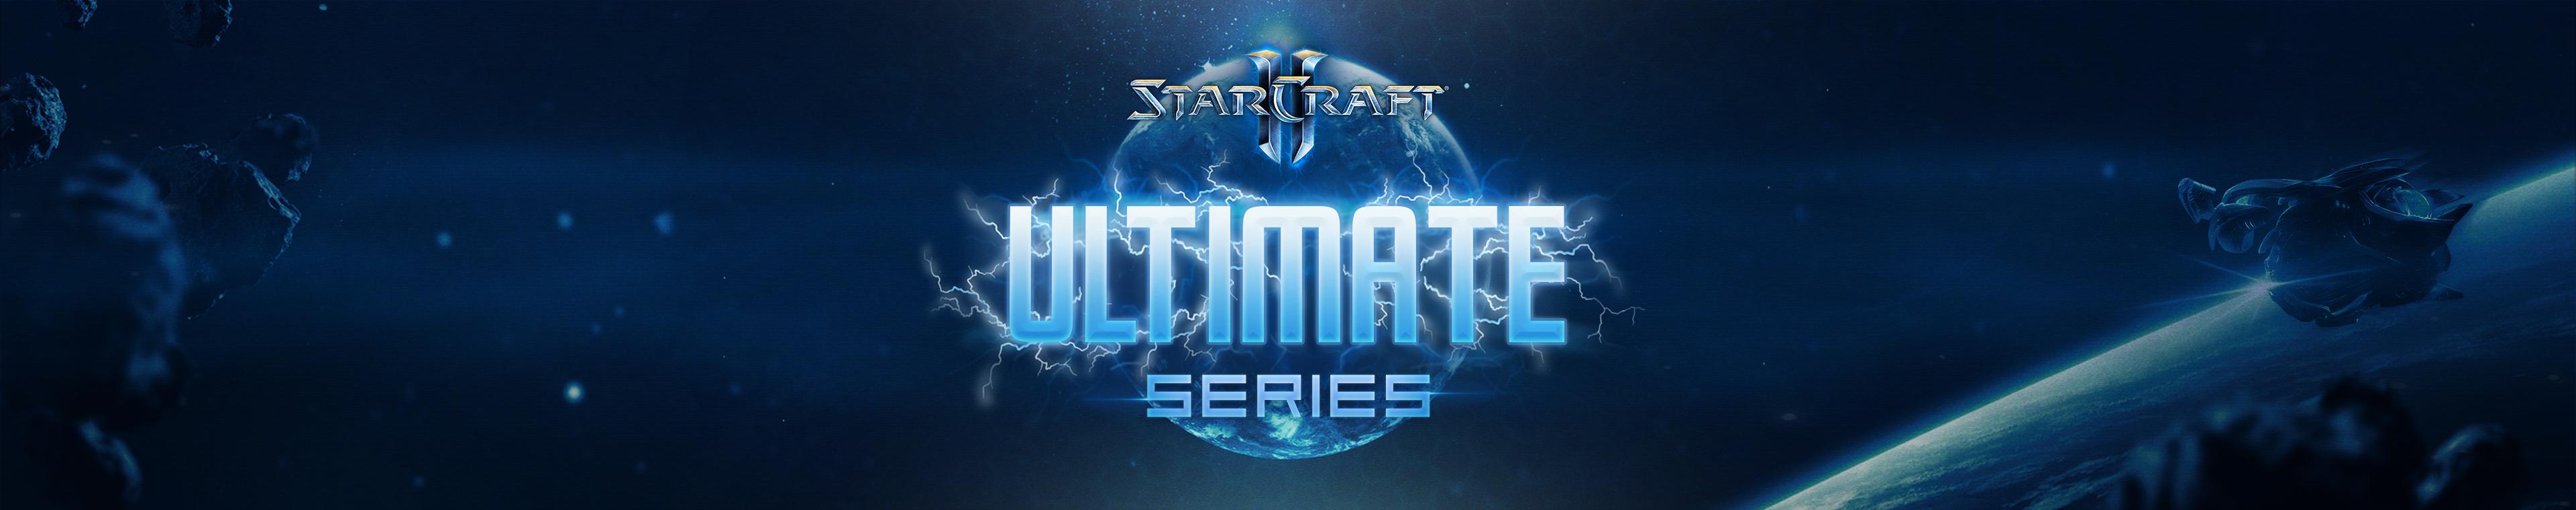 Ultimate Series 2018 Season 2 - Global Playoff